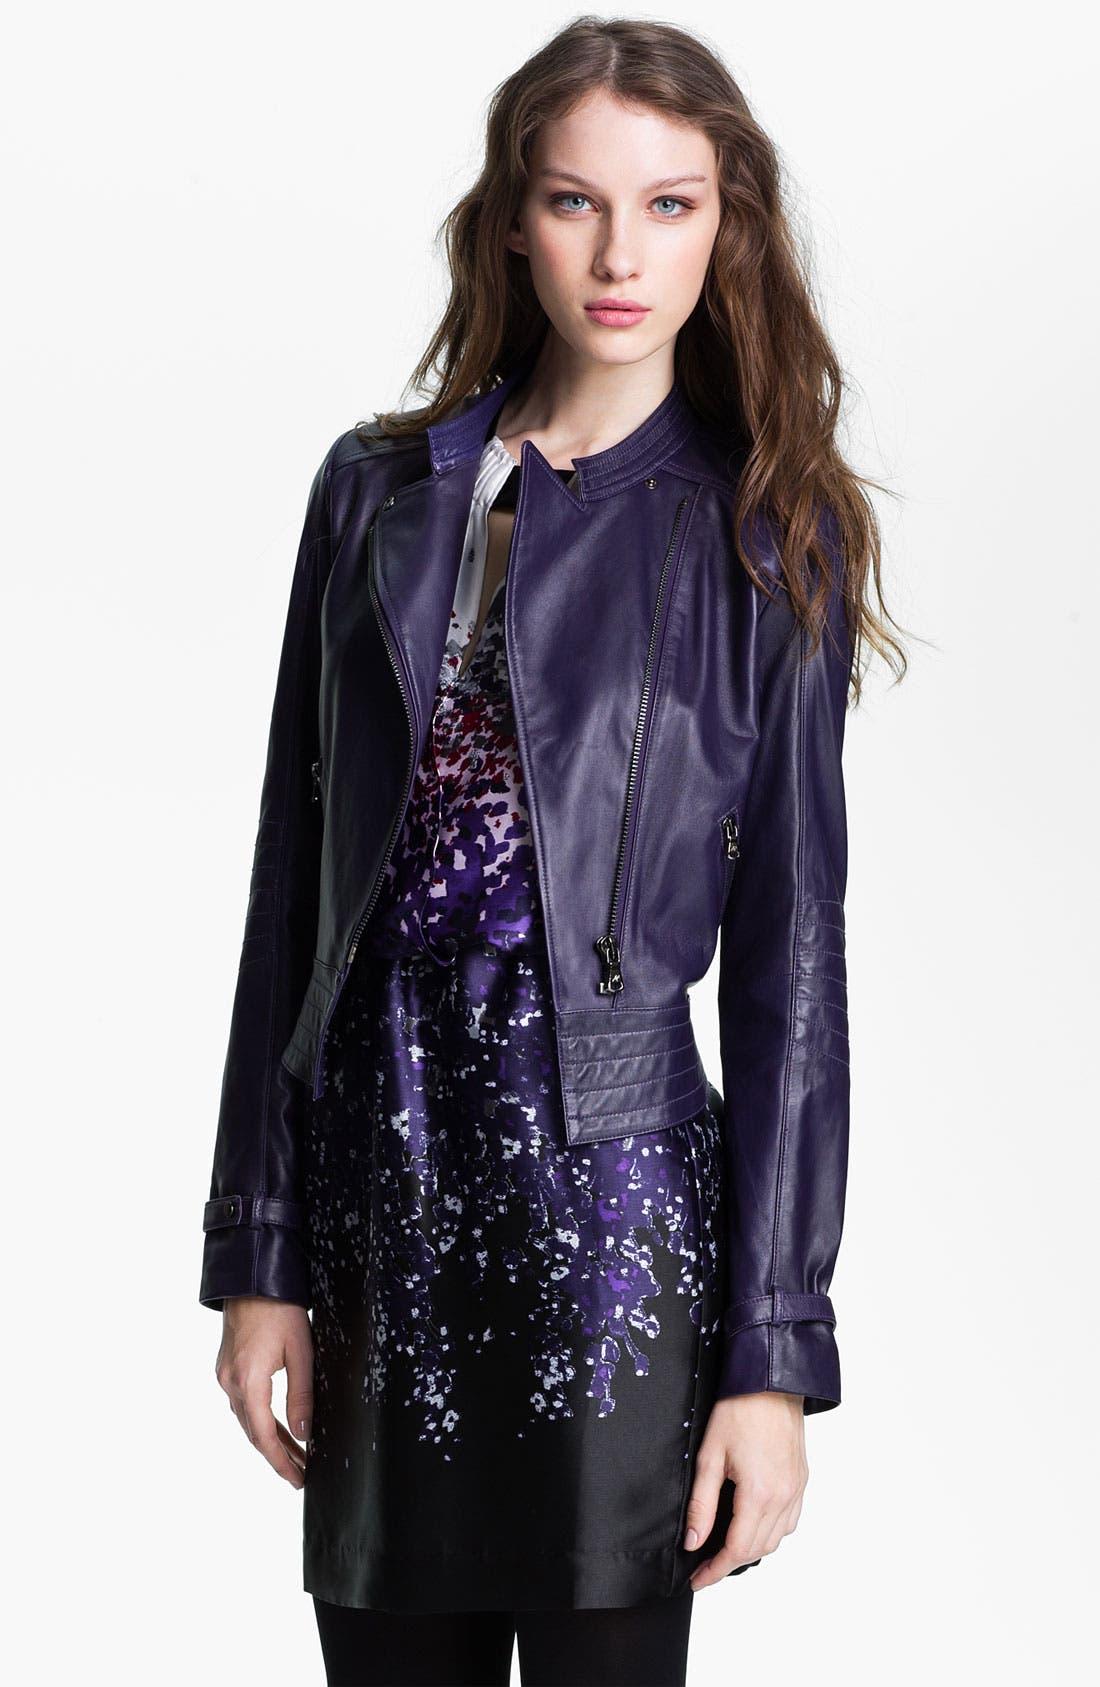 Main Image - Kenneth Cole New York 'Maria' Metallic Leather Jacket